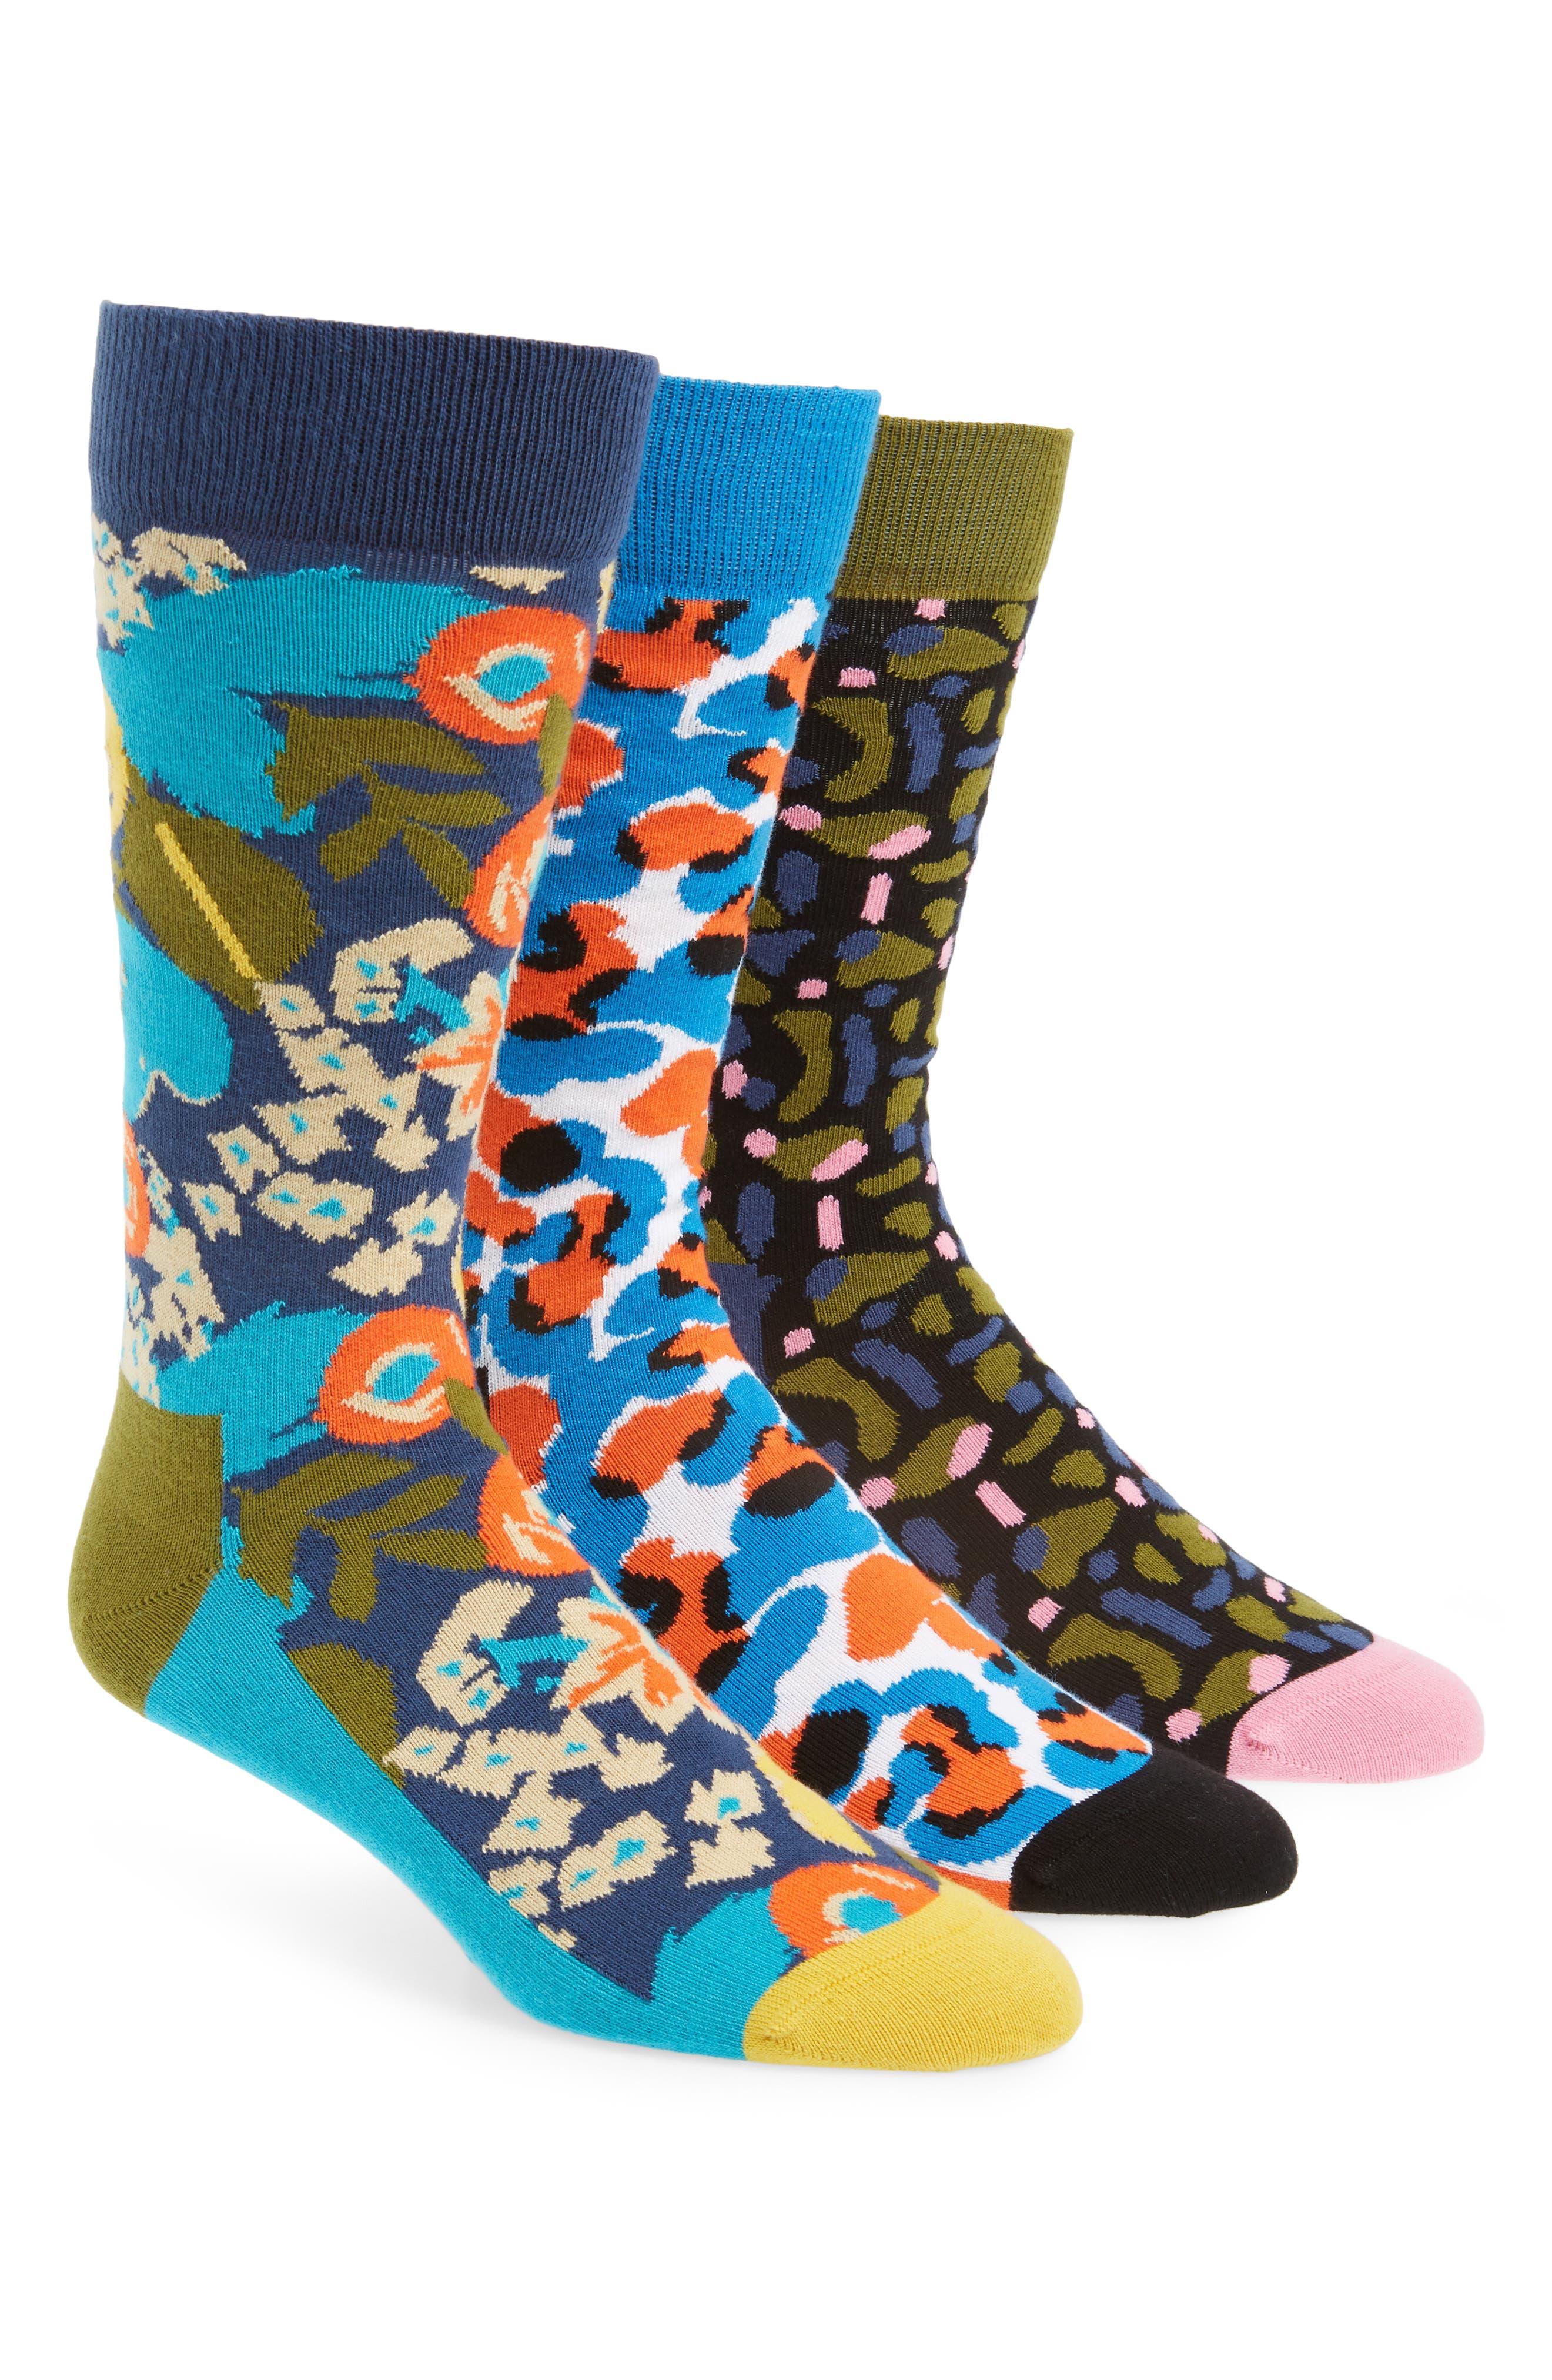 Wiz Khalifa 3-Pack Socks Boxed Set,                             Main thumbnail 1, color,                             462